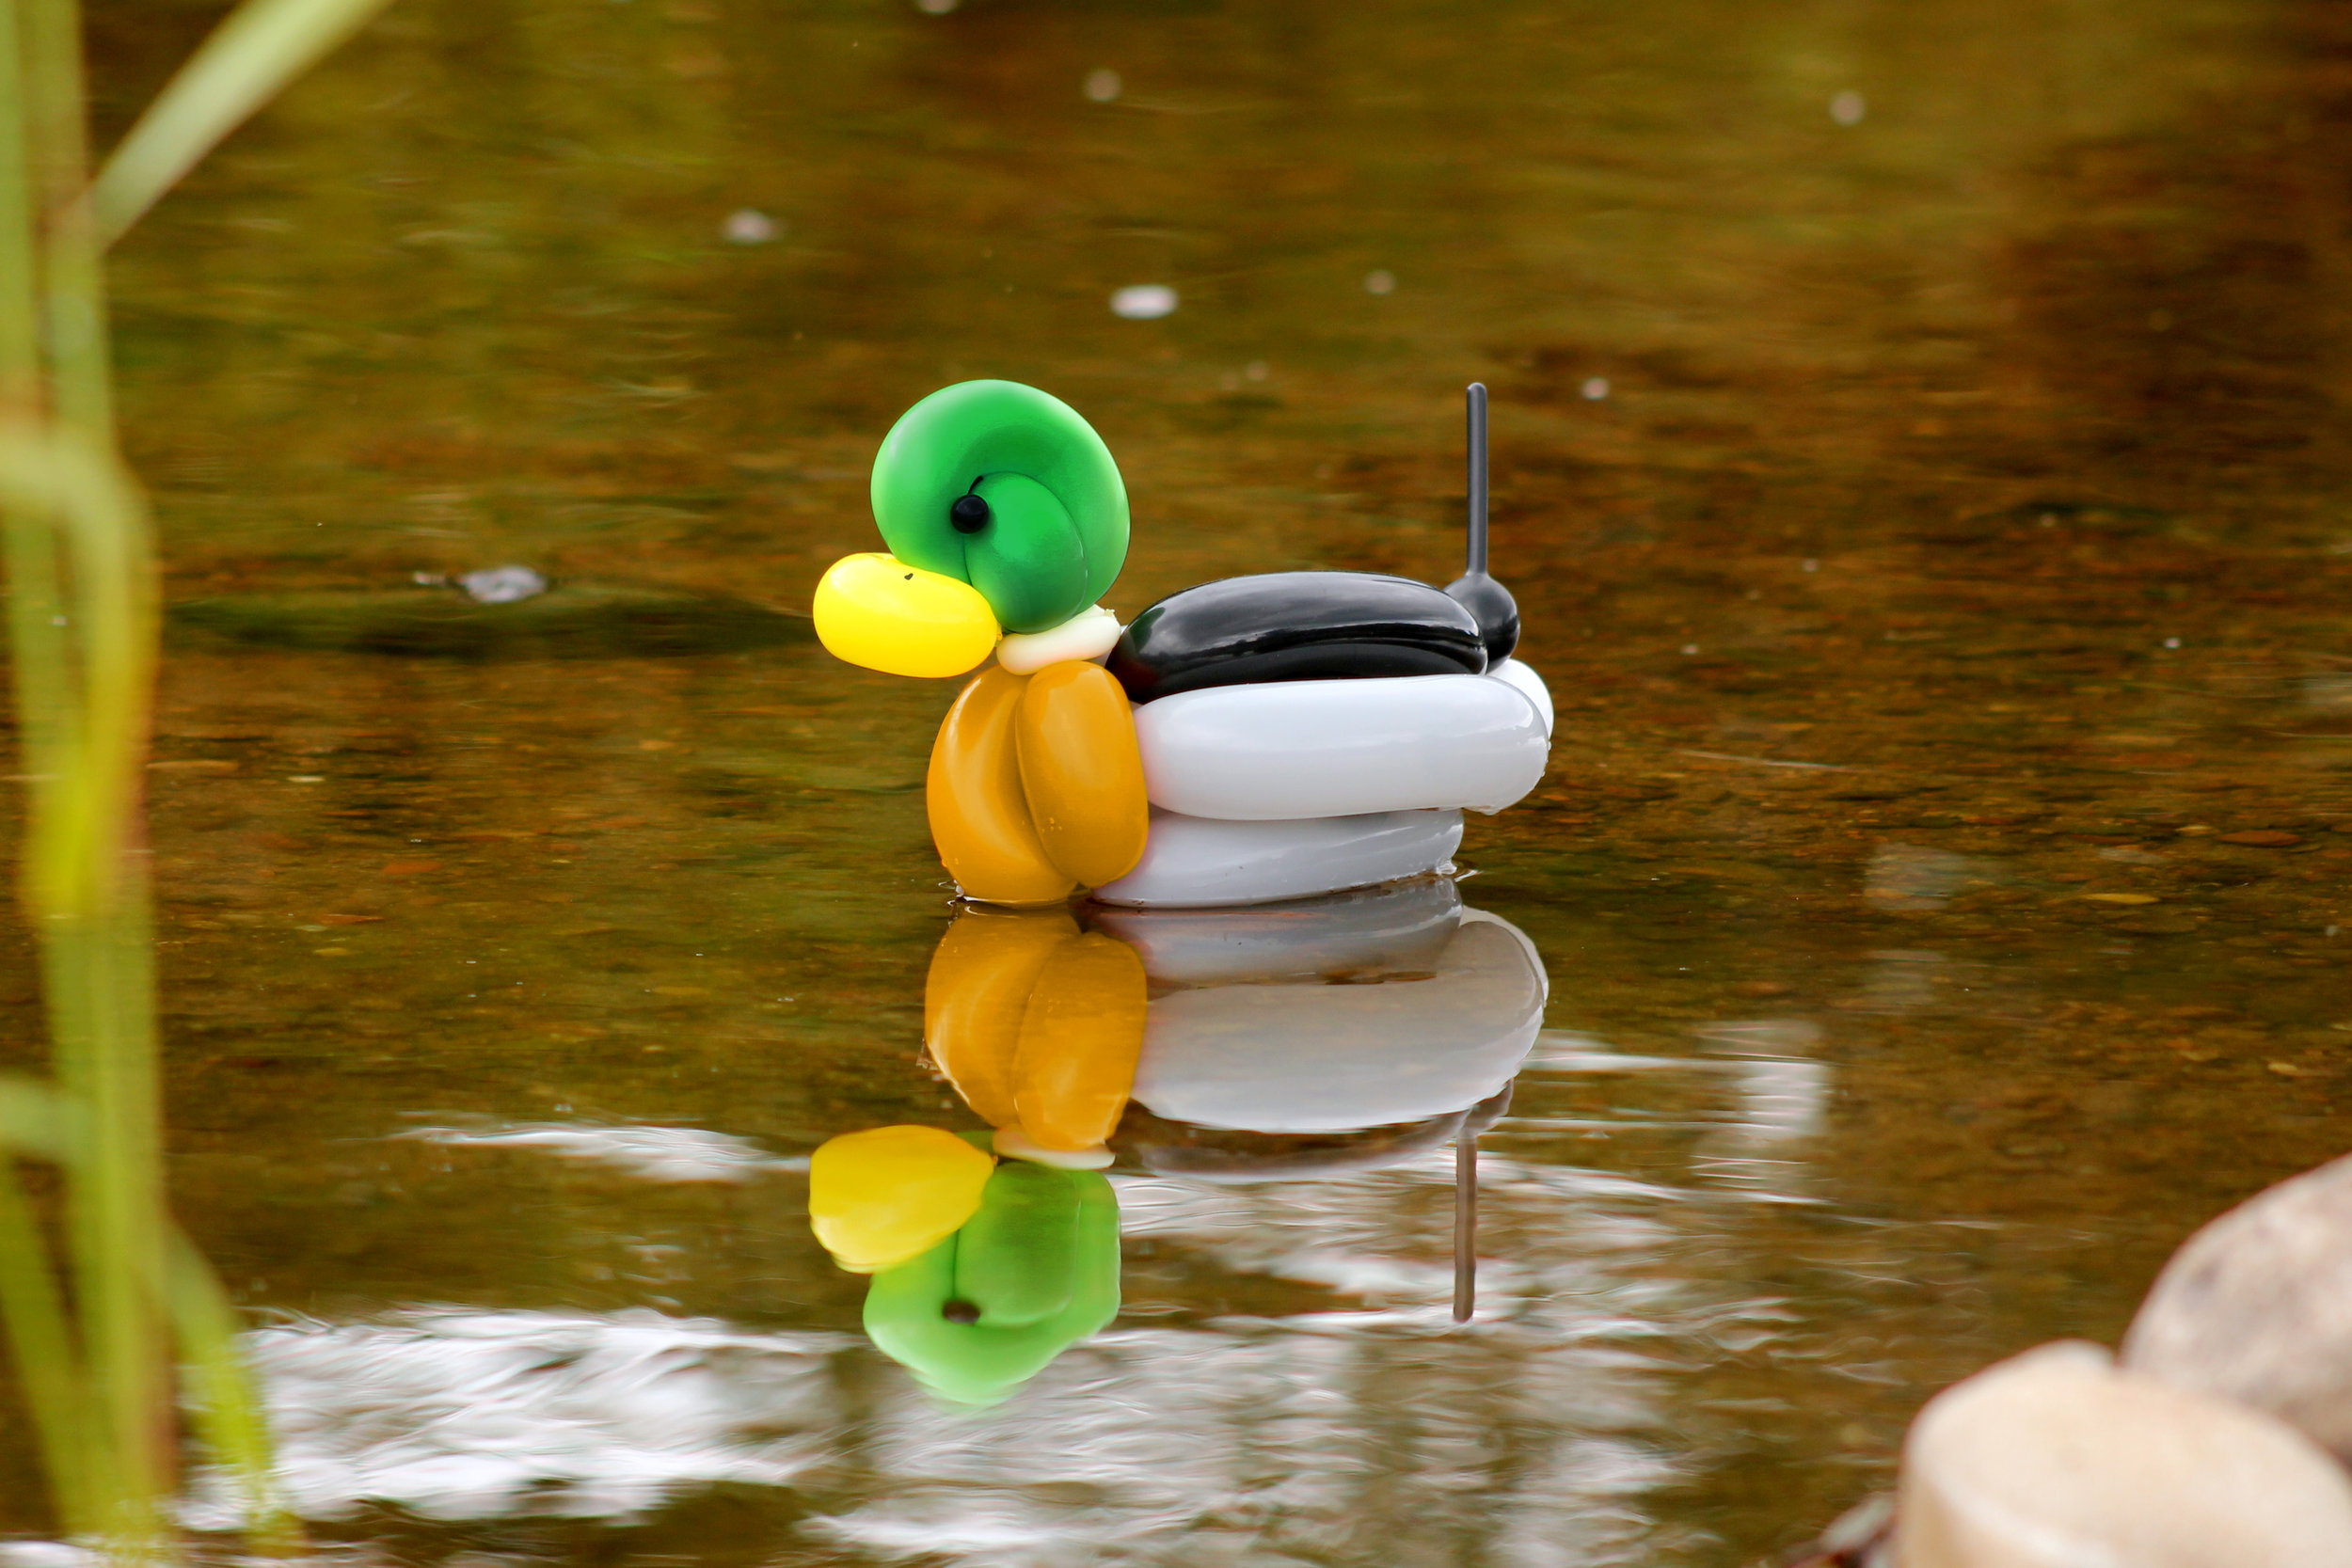 DuckFinal2.jpg